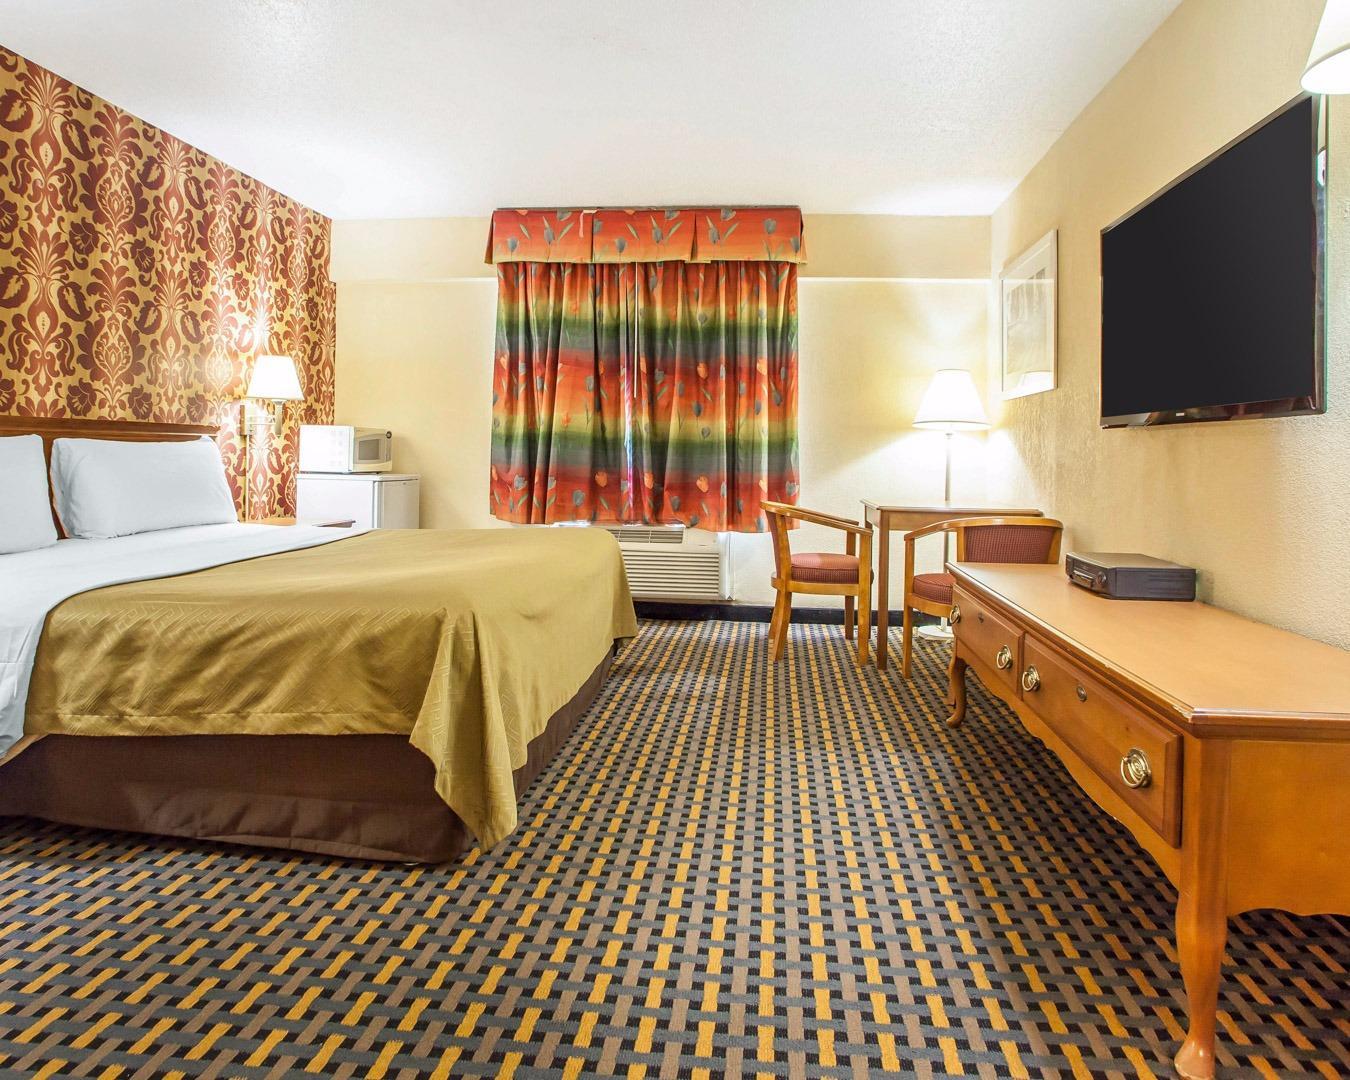 Hotel Econo Lodge Jersey City Jersey City New York